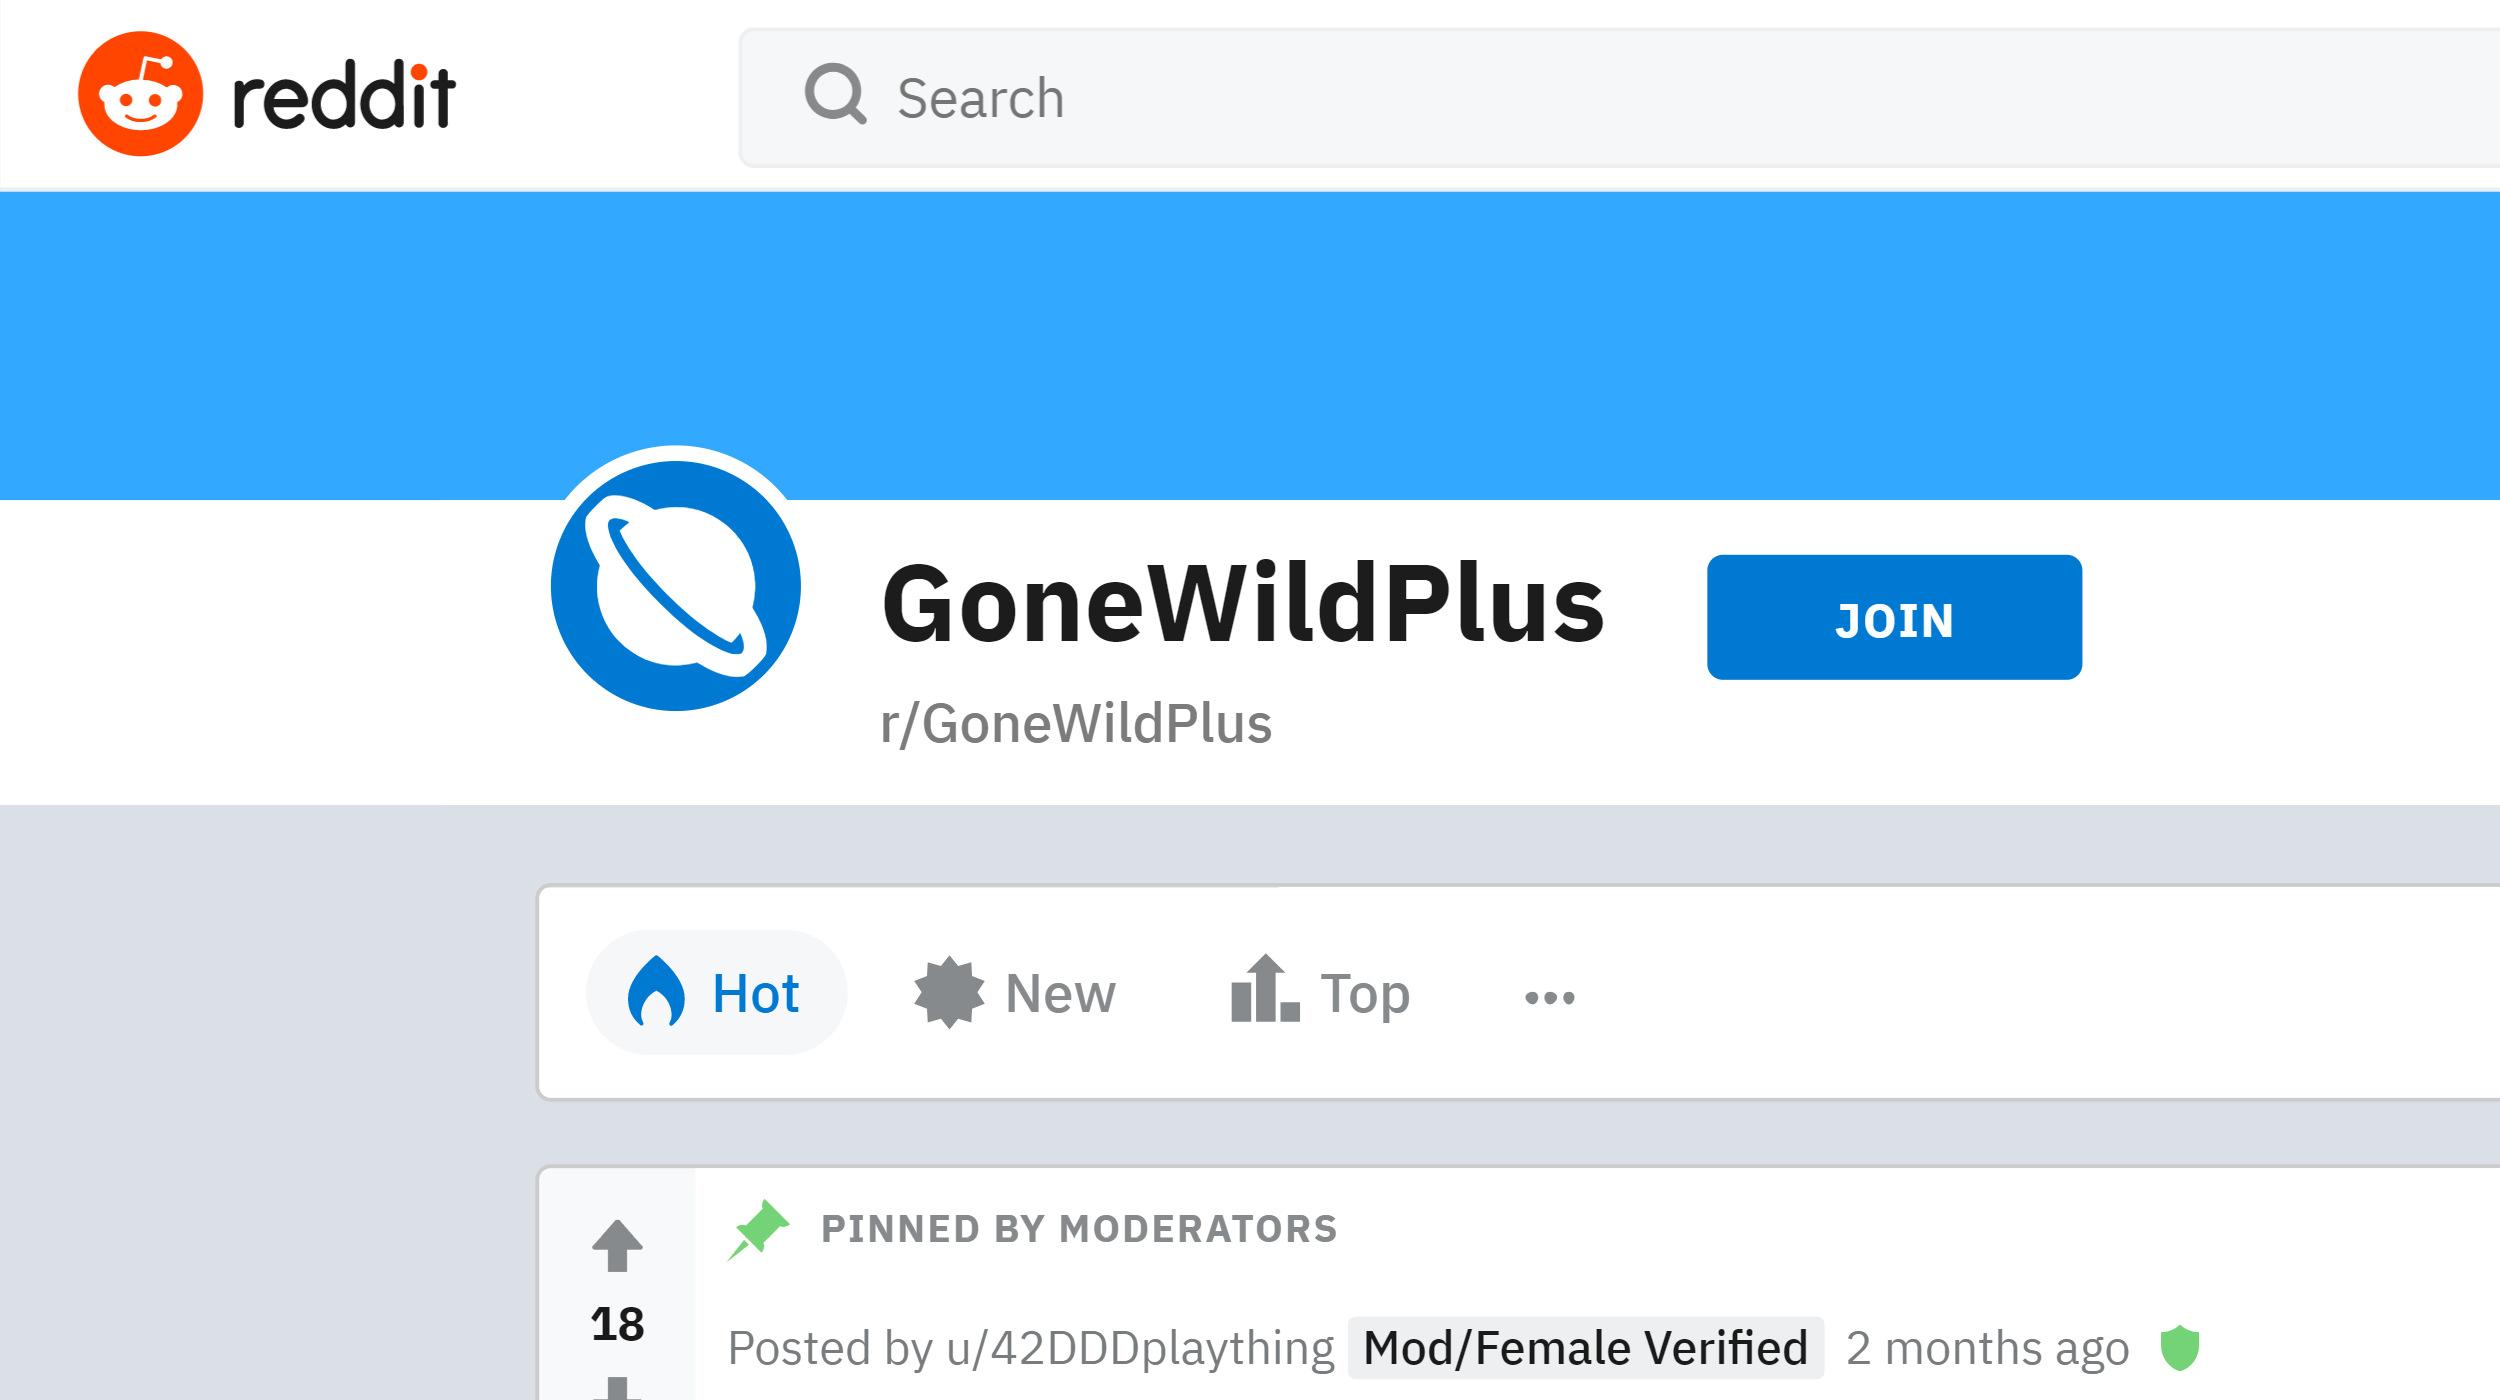 Gone Wild Plus